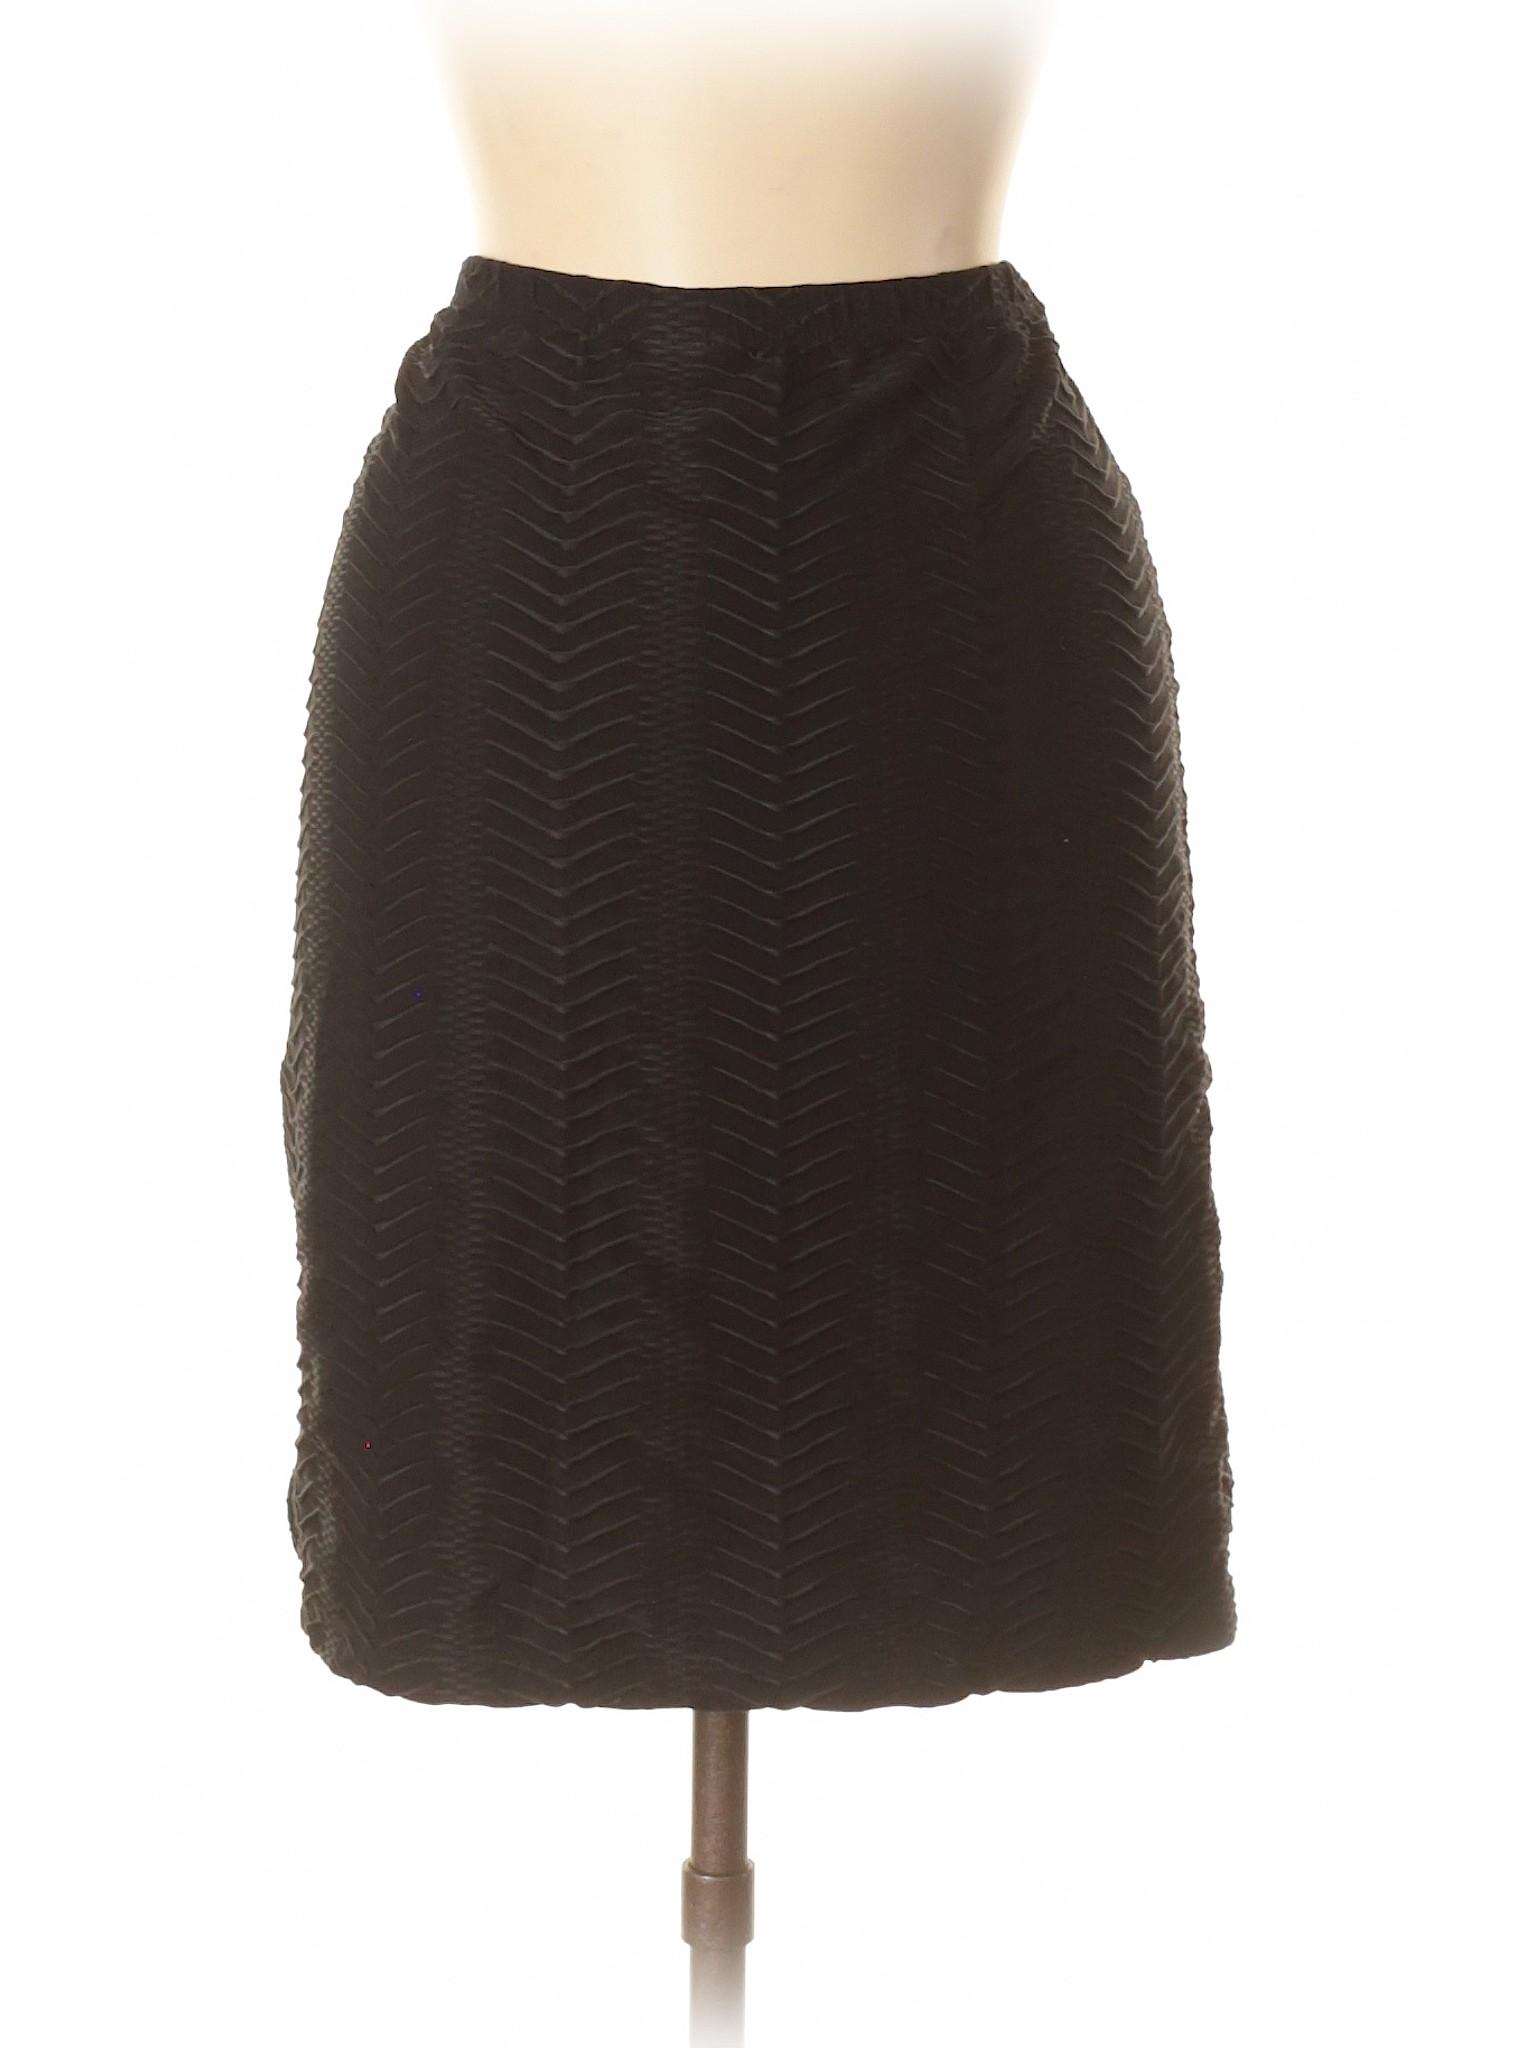 Skirt Skirt Skirt Boutique Casual Casual Boutique Boutique Boutique Casual Casual ggzF5qT